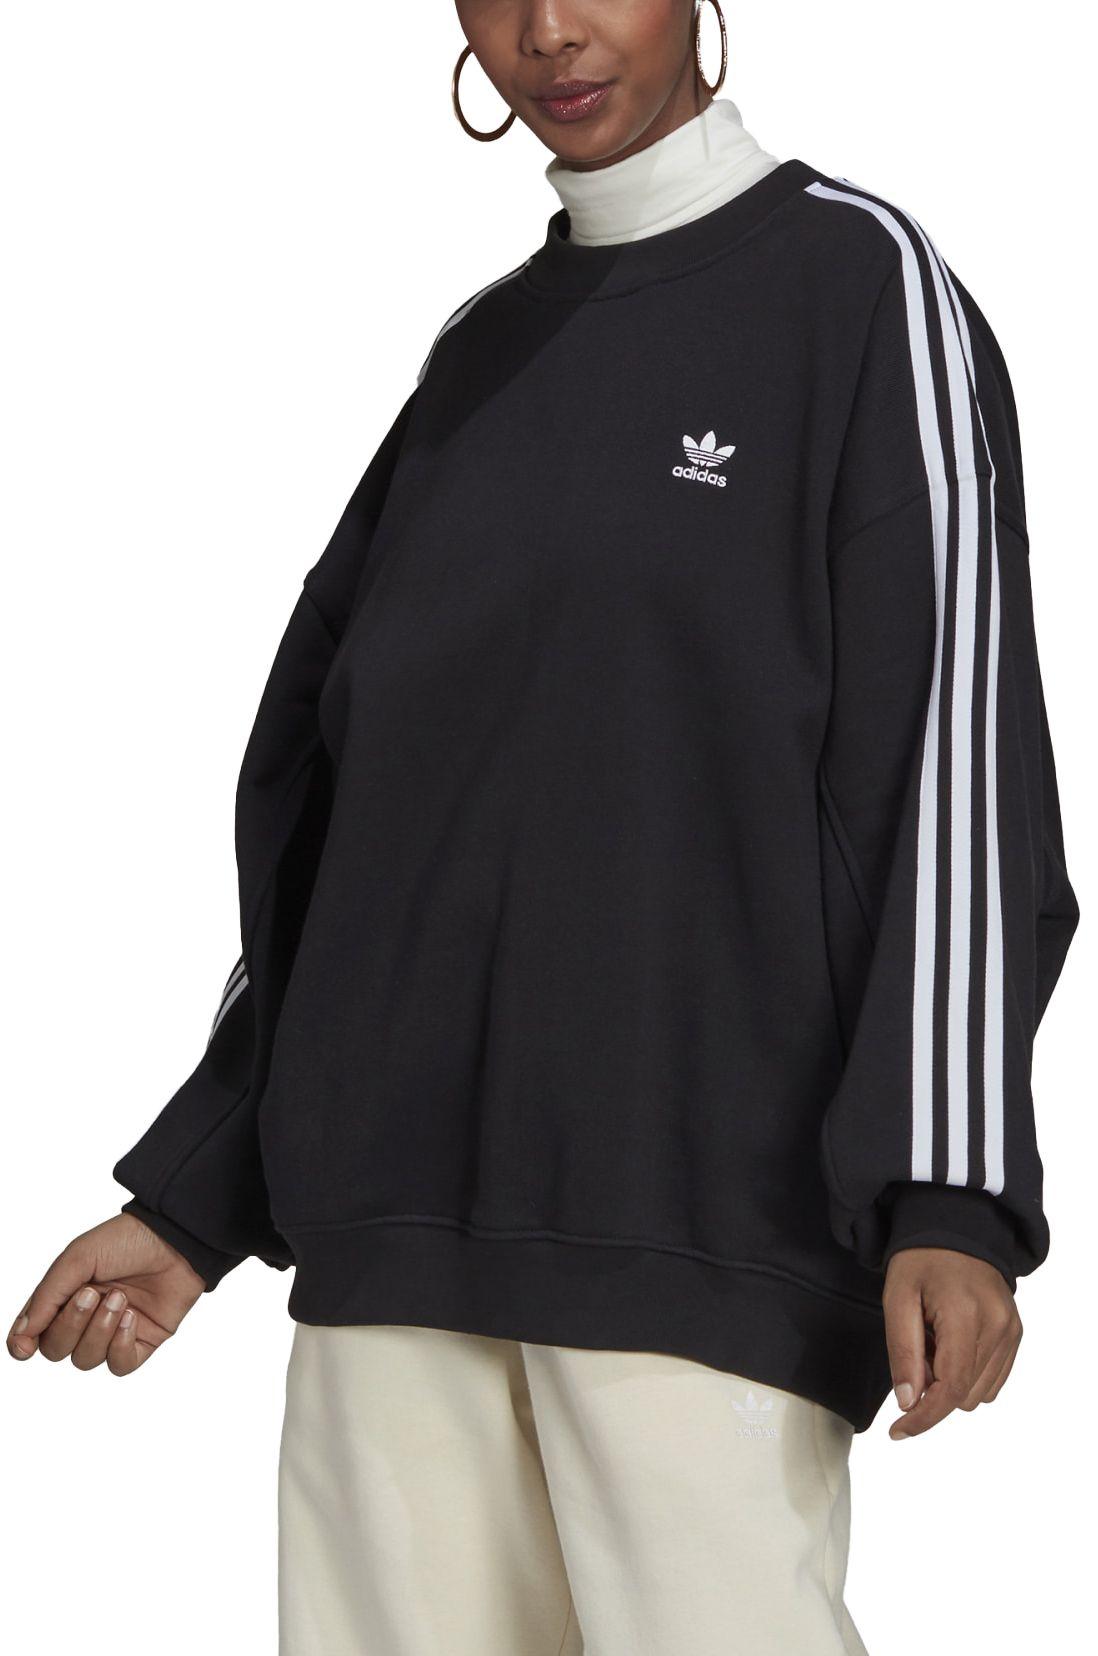 Adidas Crew Sweat OS SWEATSHIRT Black